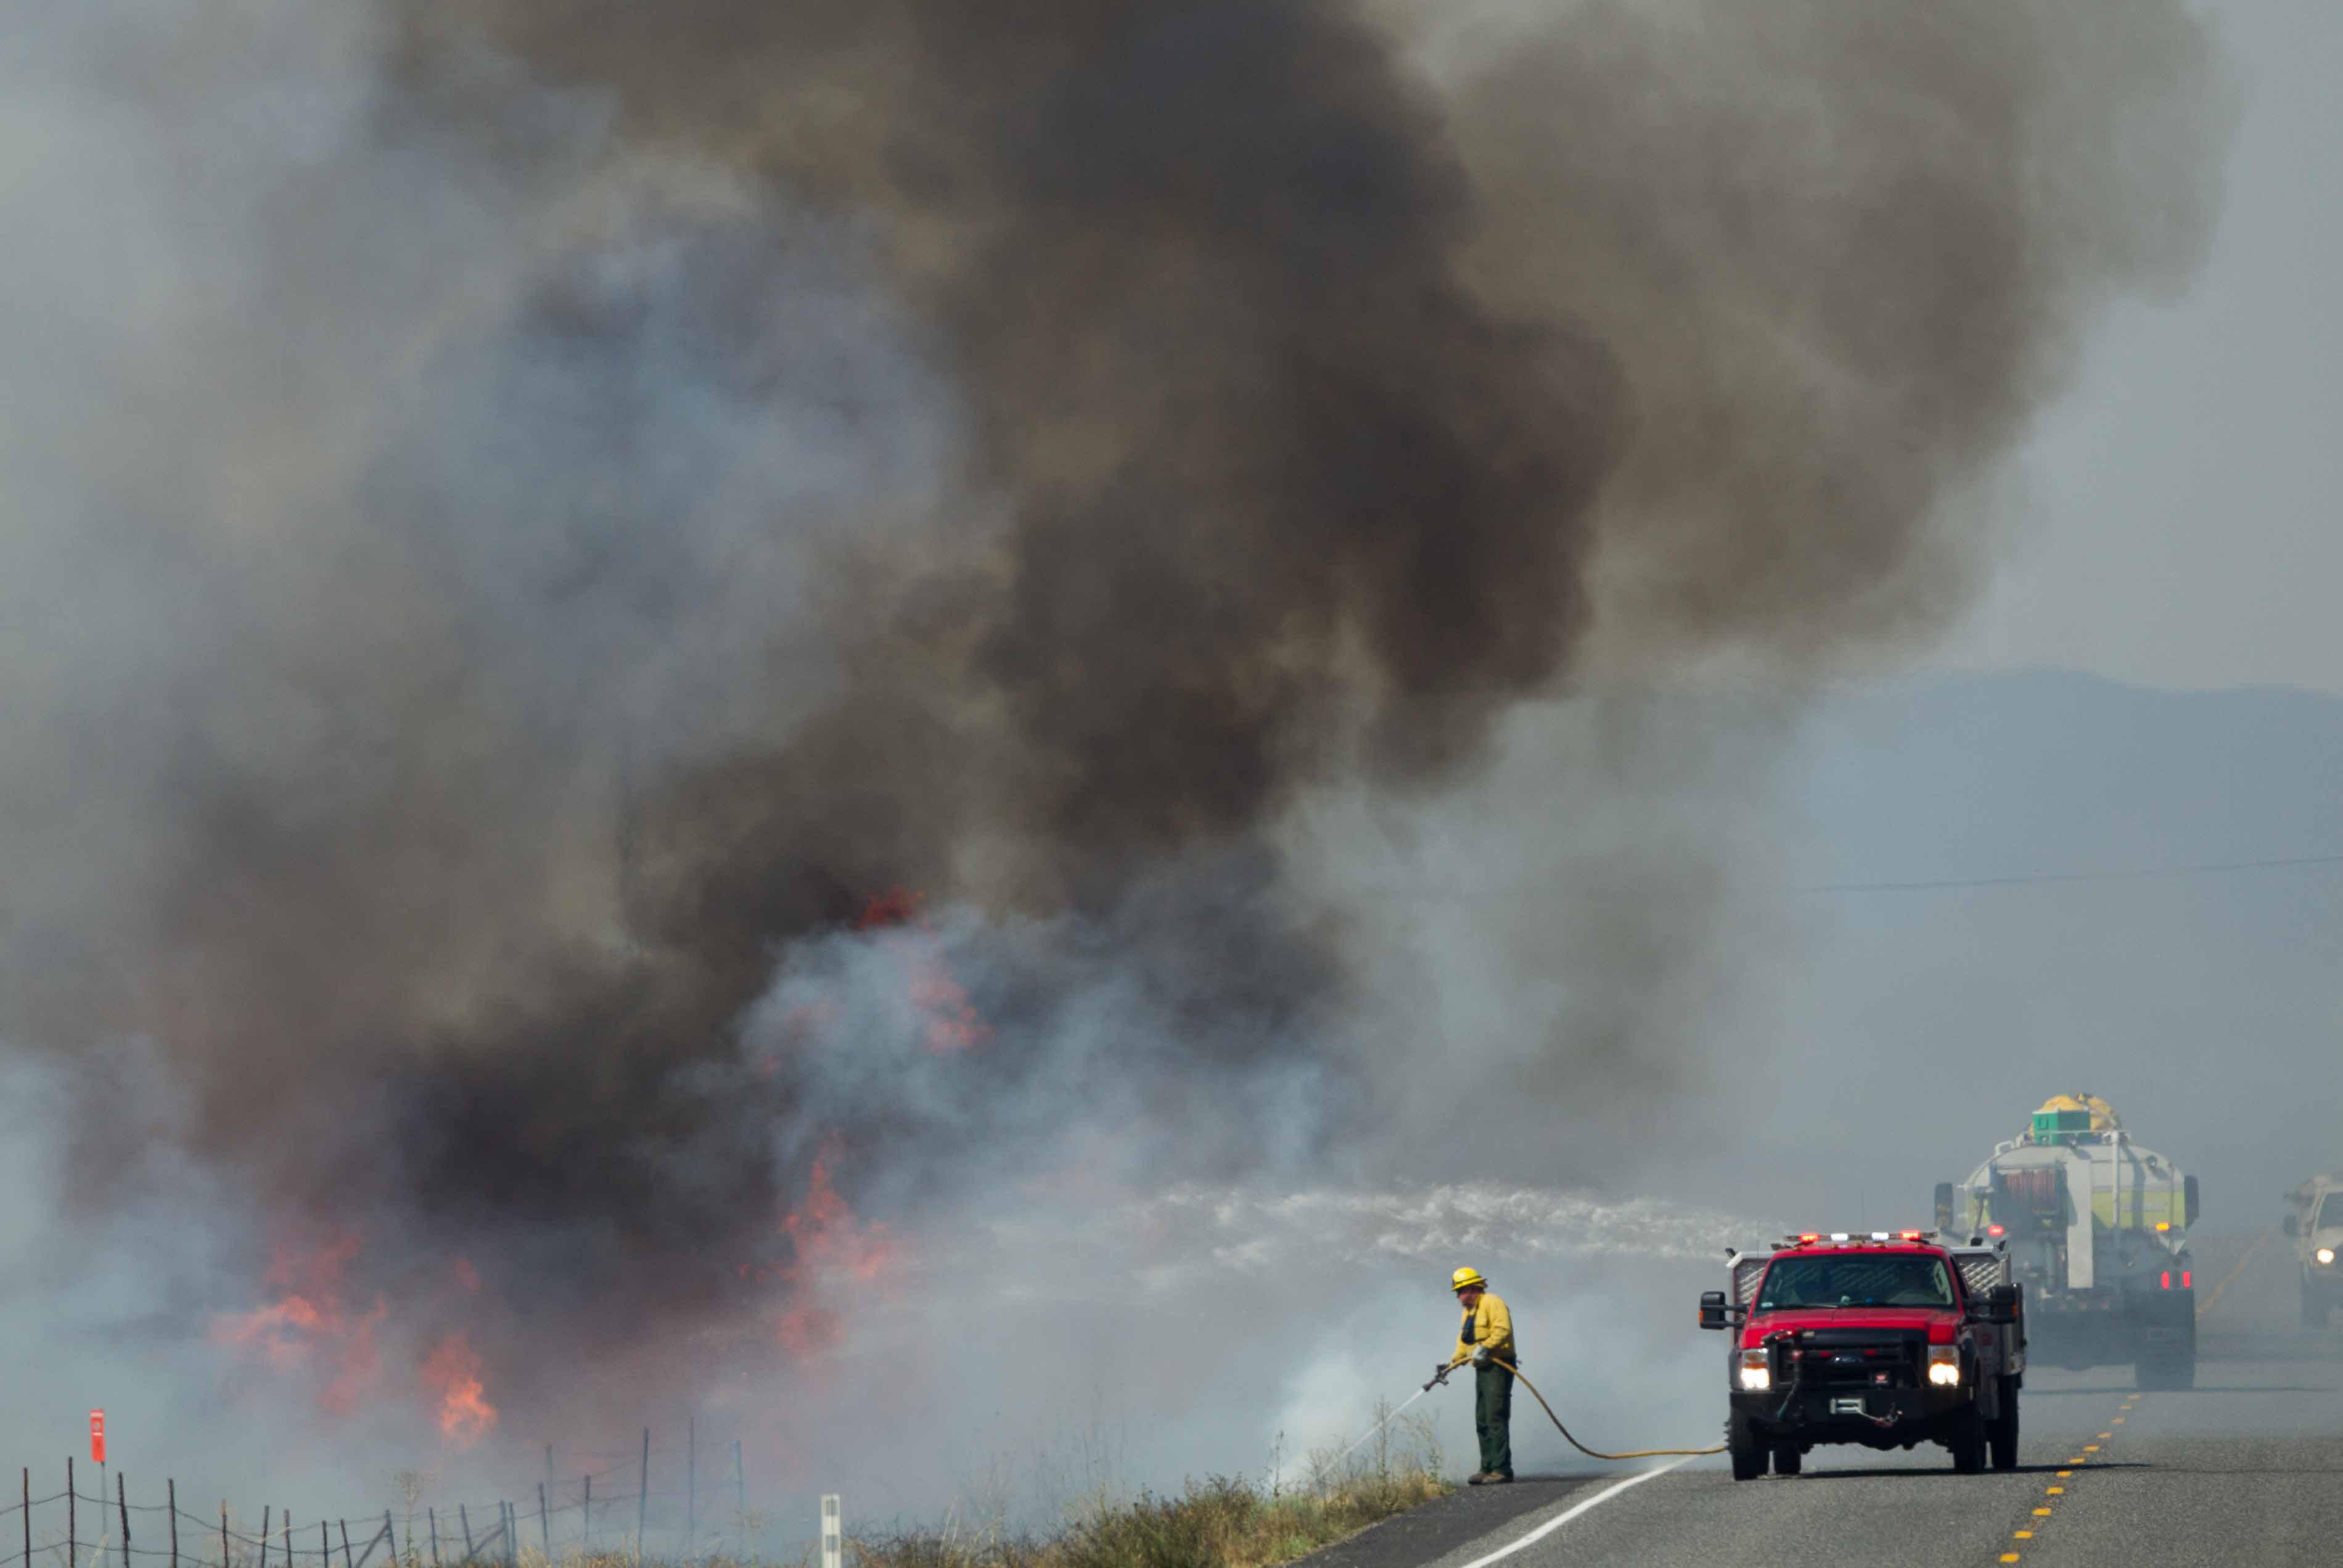 In this Sunday, July 31, 2016 photo, a wildfire burns between Moxee and Sunnyside, Wash.  (Sofia Jaramillo/Yakima Herald-Republic via AP)